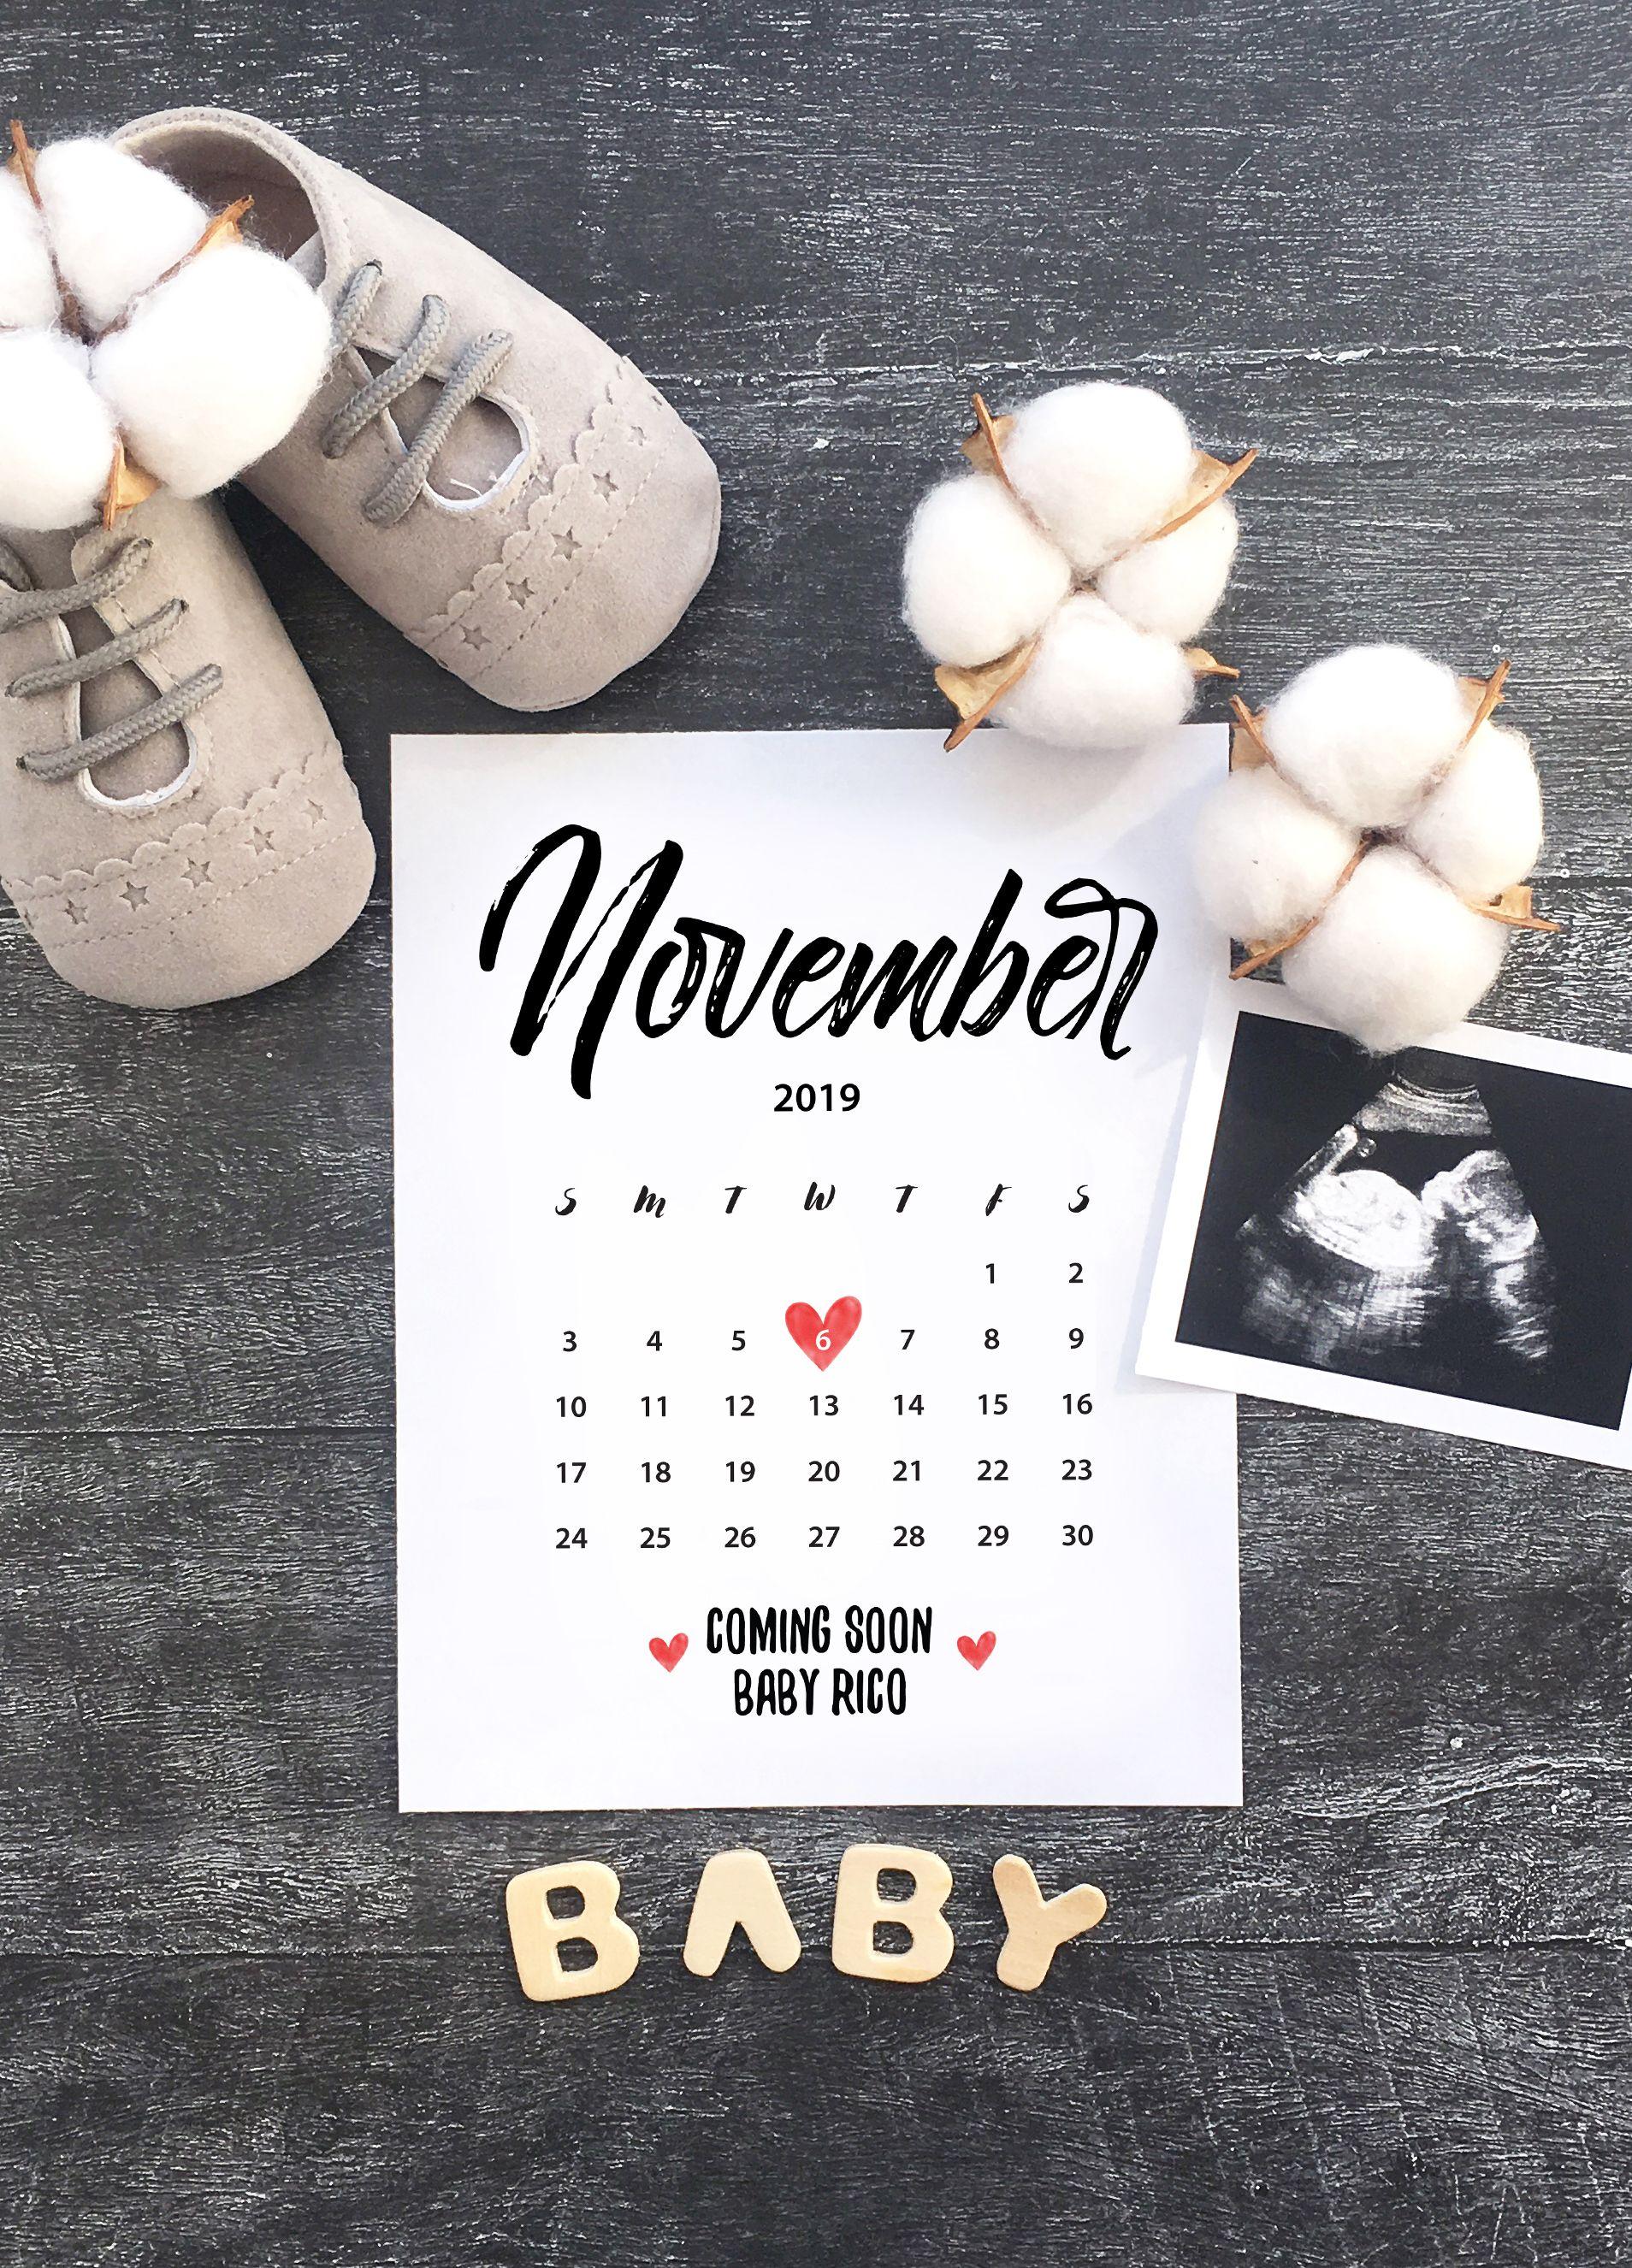 Pin on Pregnancy announcement ideas